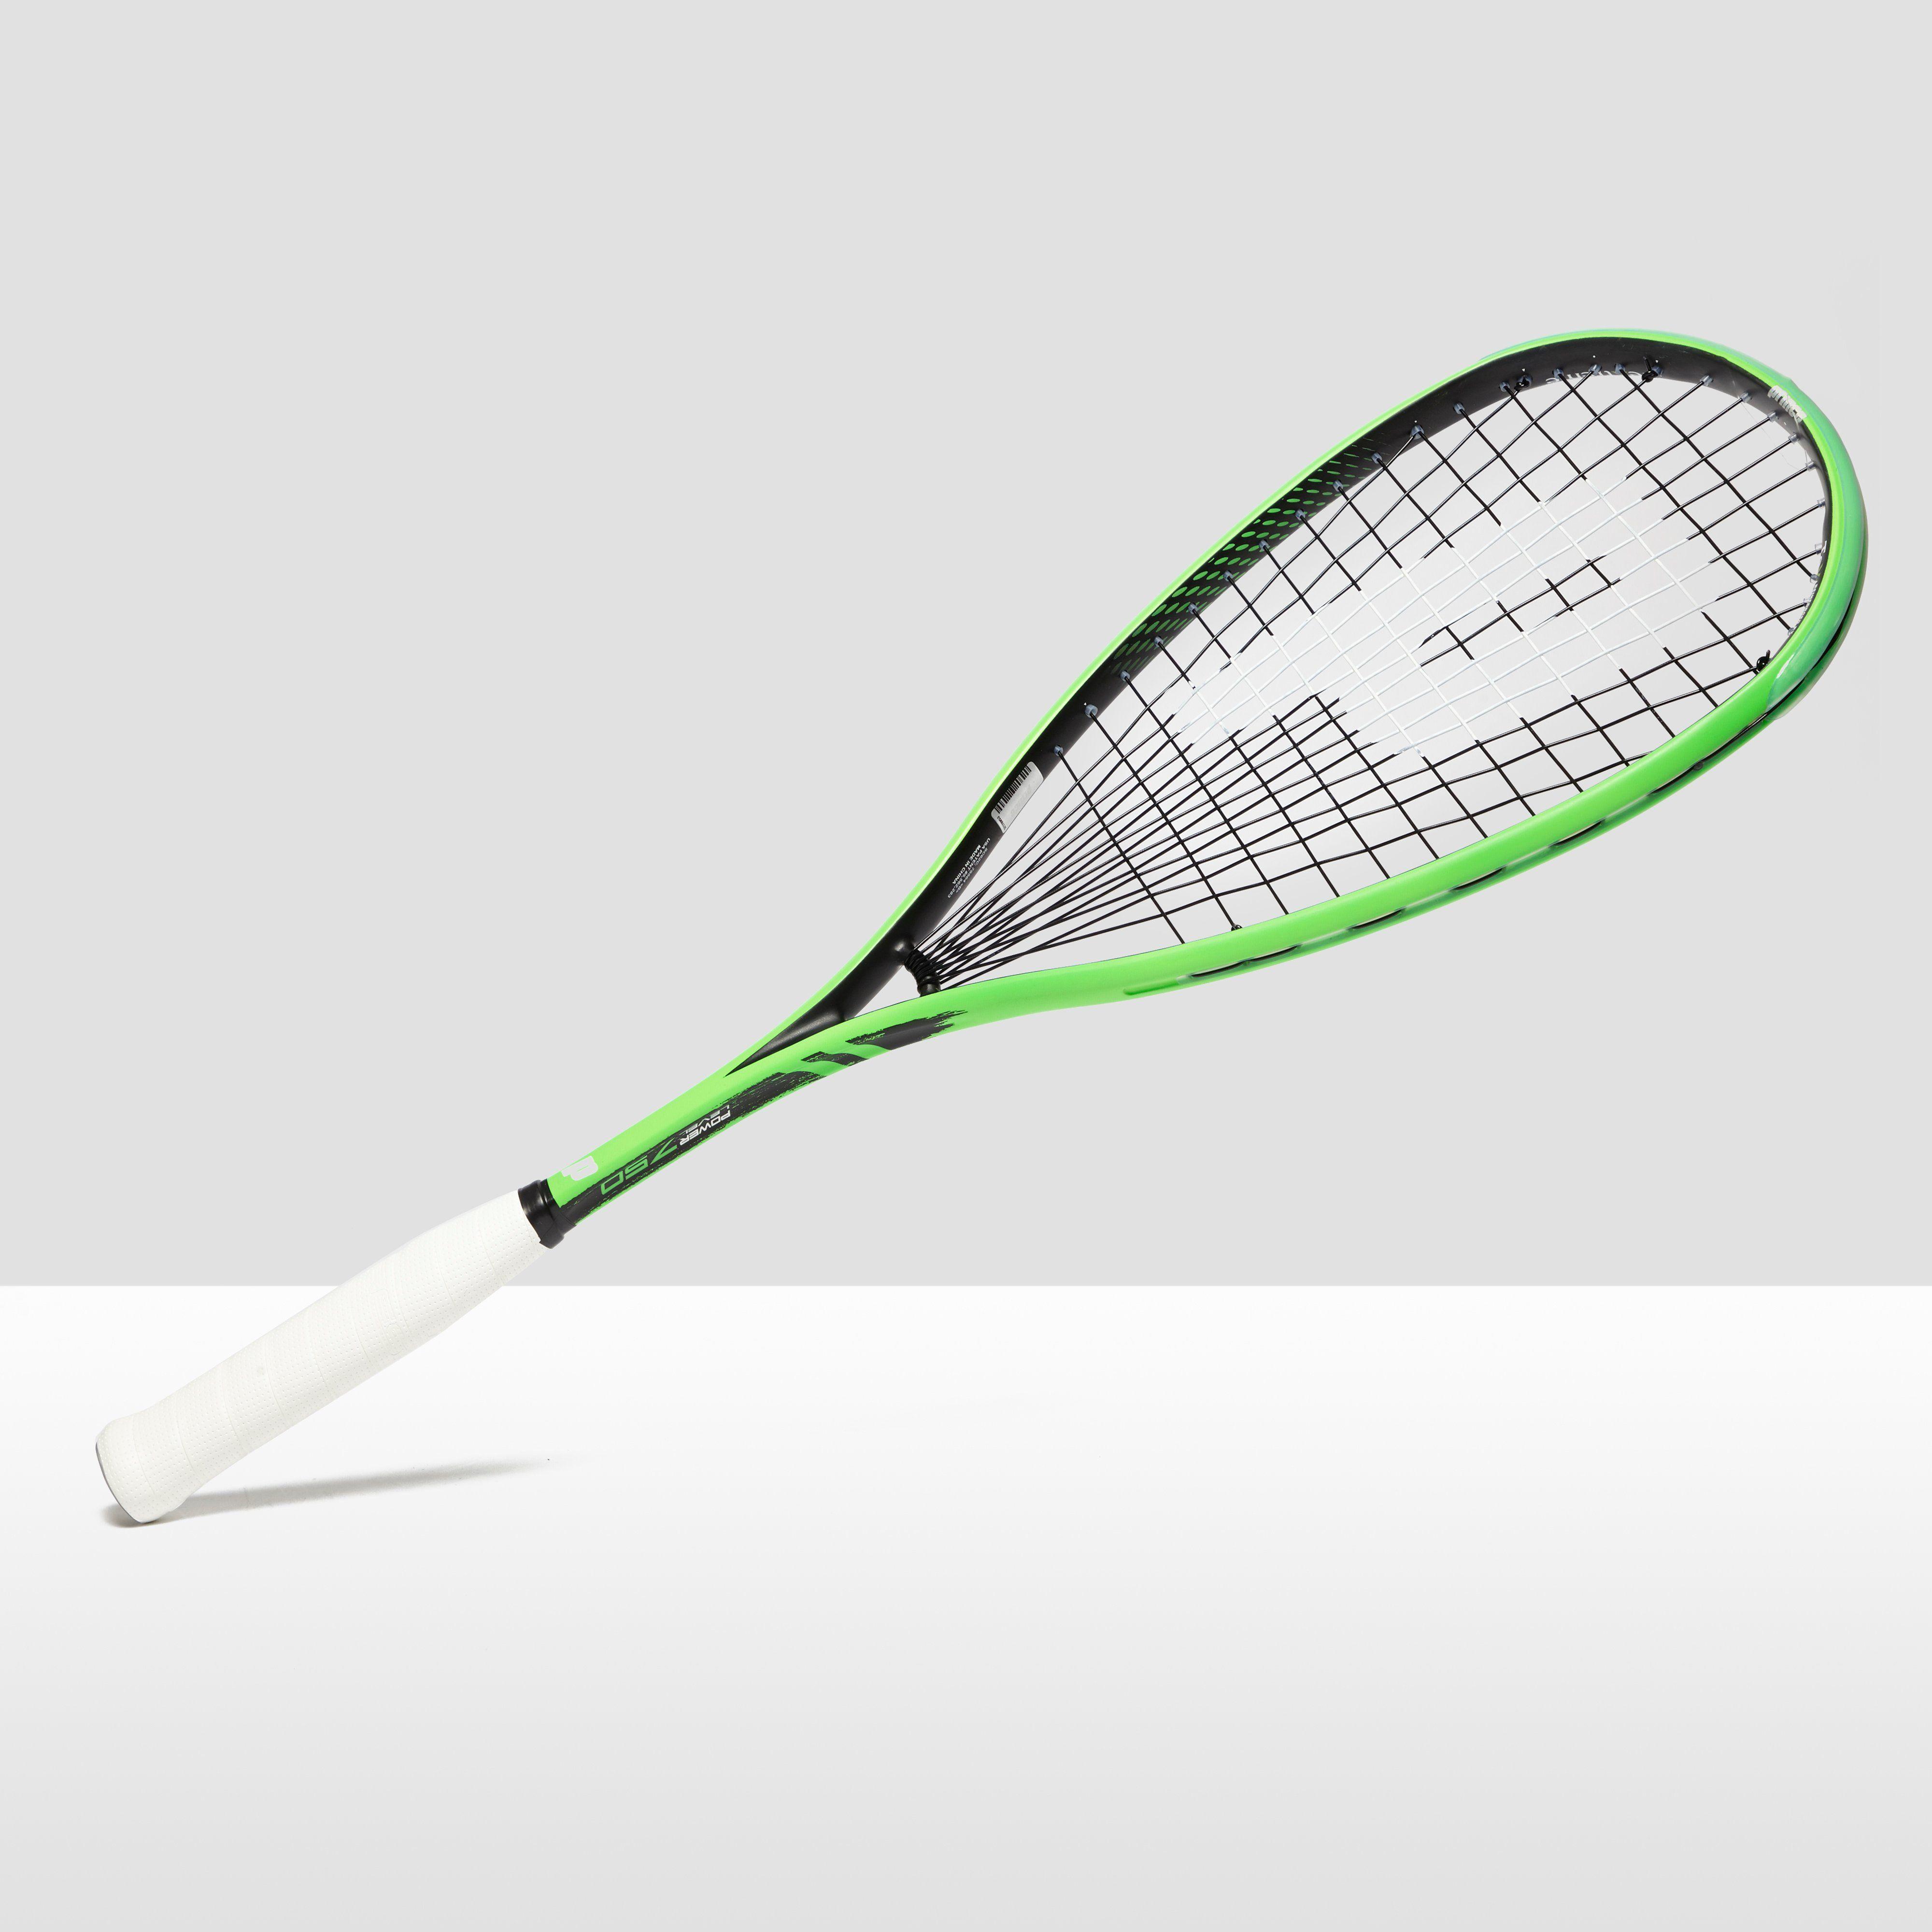 Prince Pro Beast 750 Squash Racket